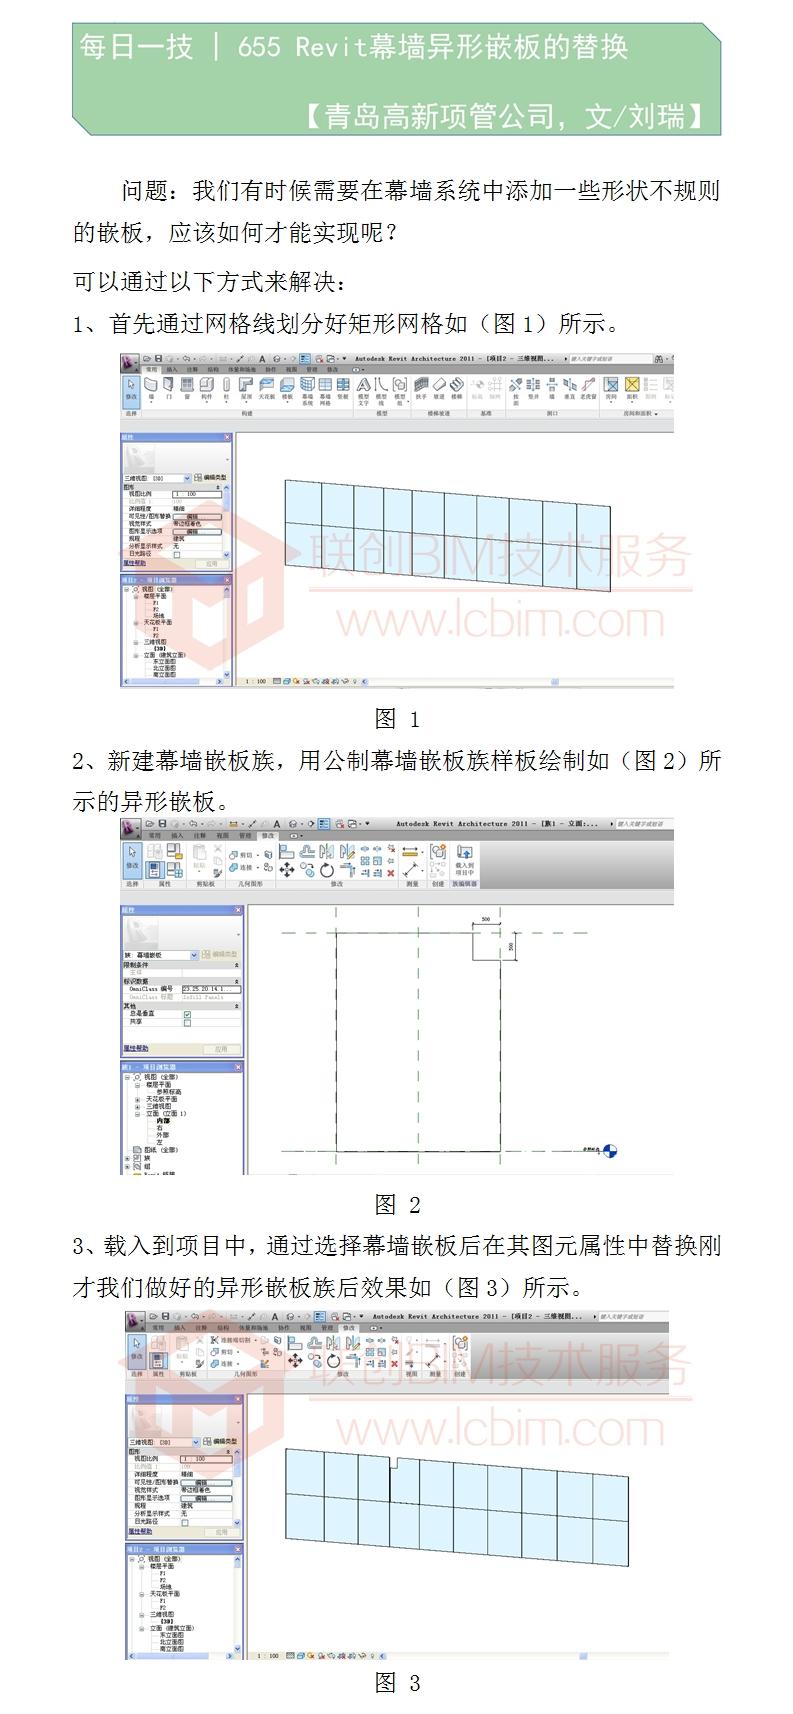 655 Revit幕墙异形嵌板的替换.jpg